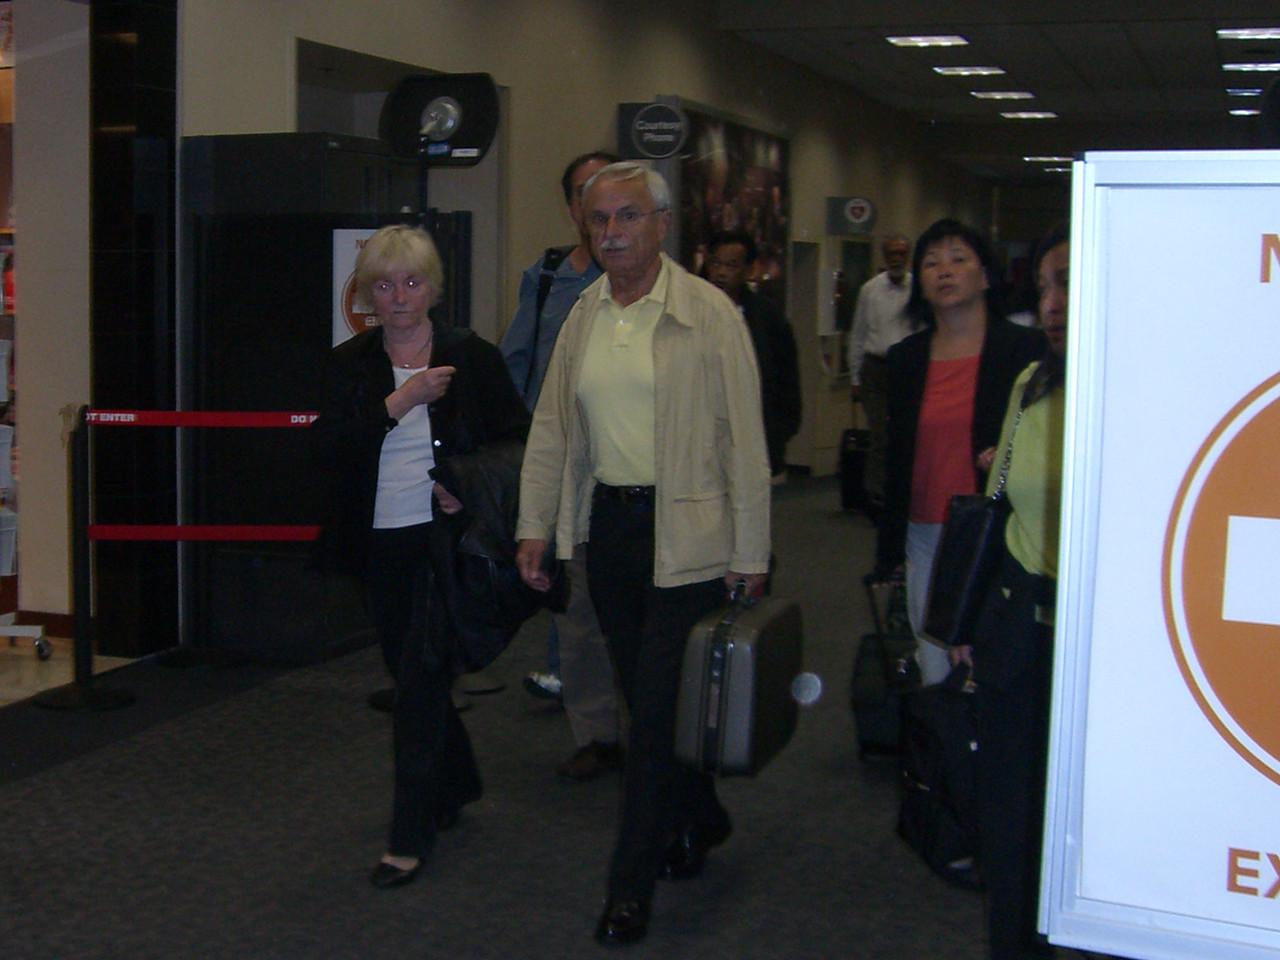 Oma & Opa arriving at SFO